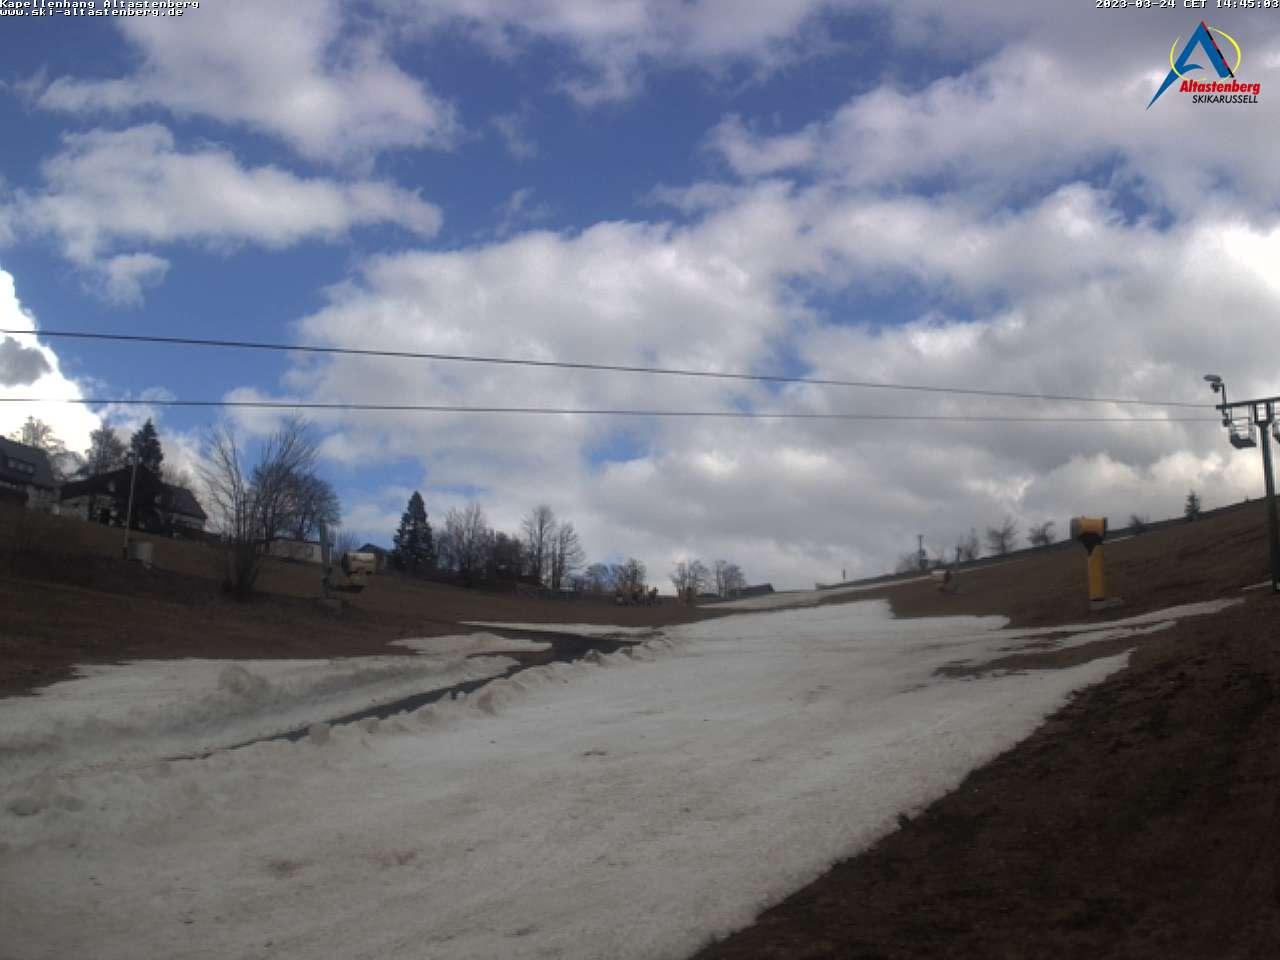 Webcam Skigebiet Altastenberg - Skiliftkarussell Winterberg